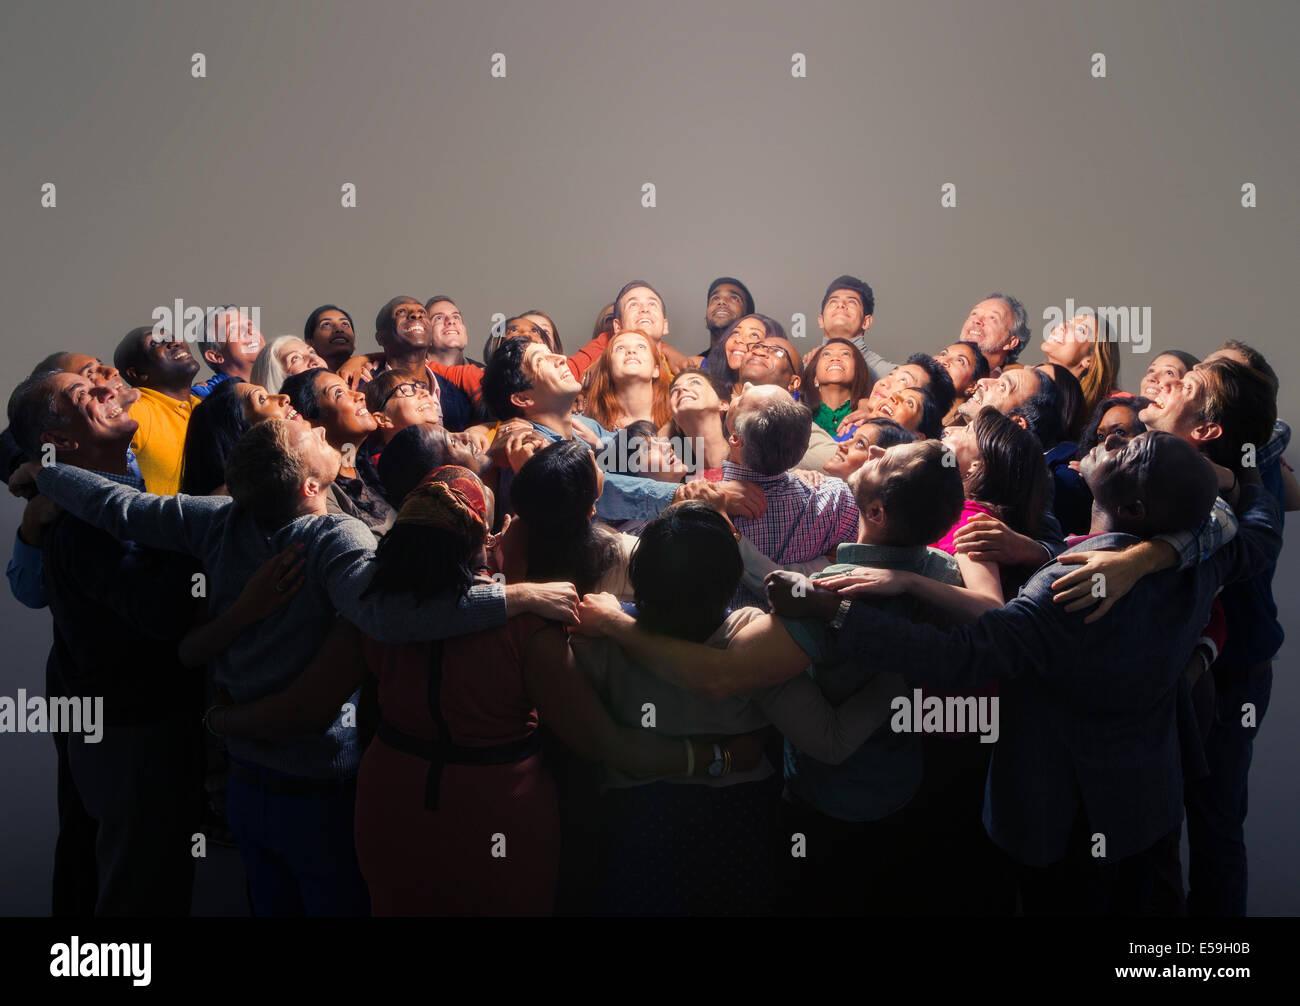 Gemischtes Publikum um helles Licht Stockbild